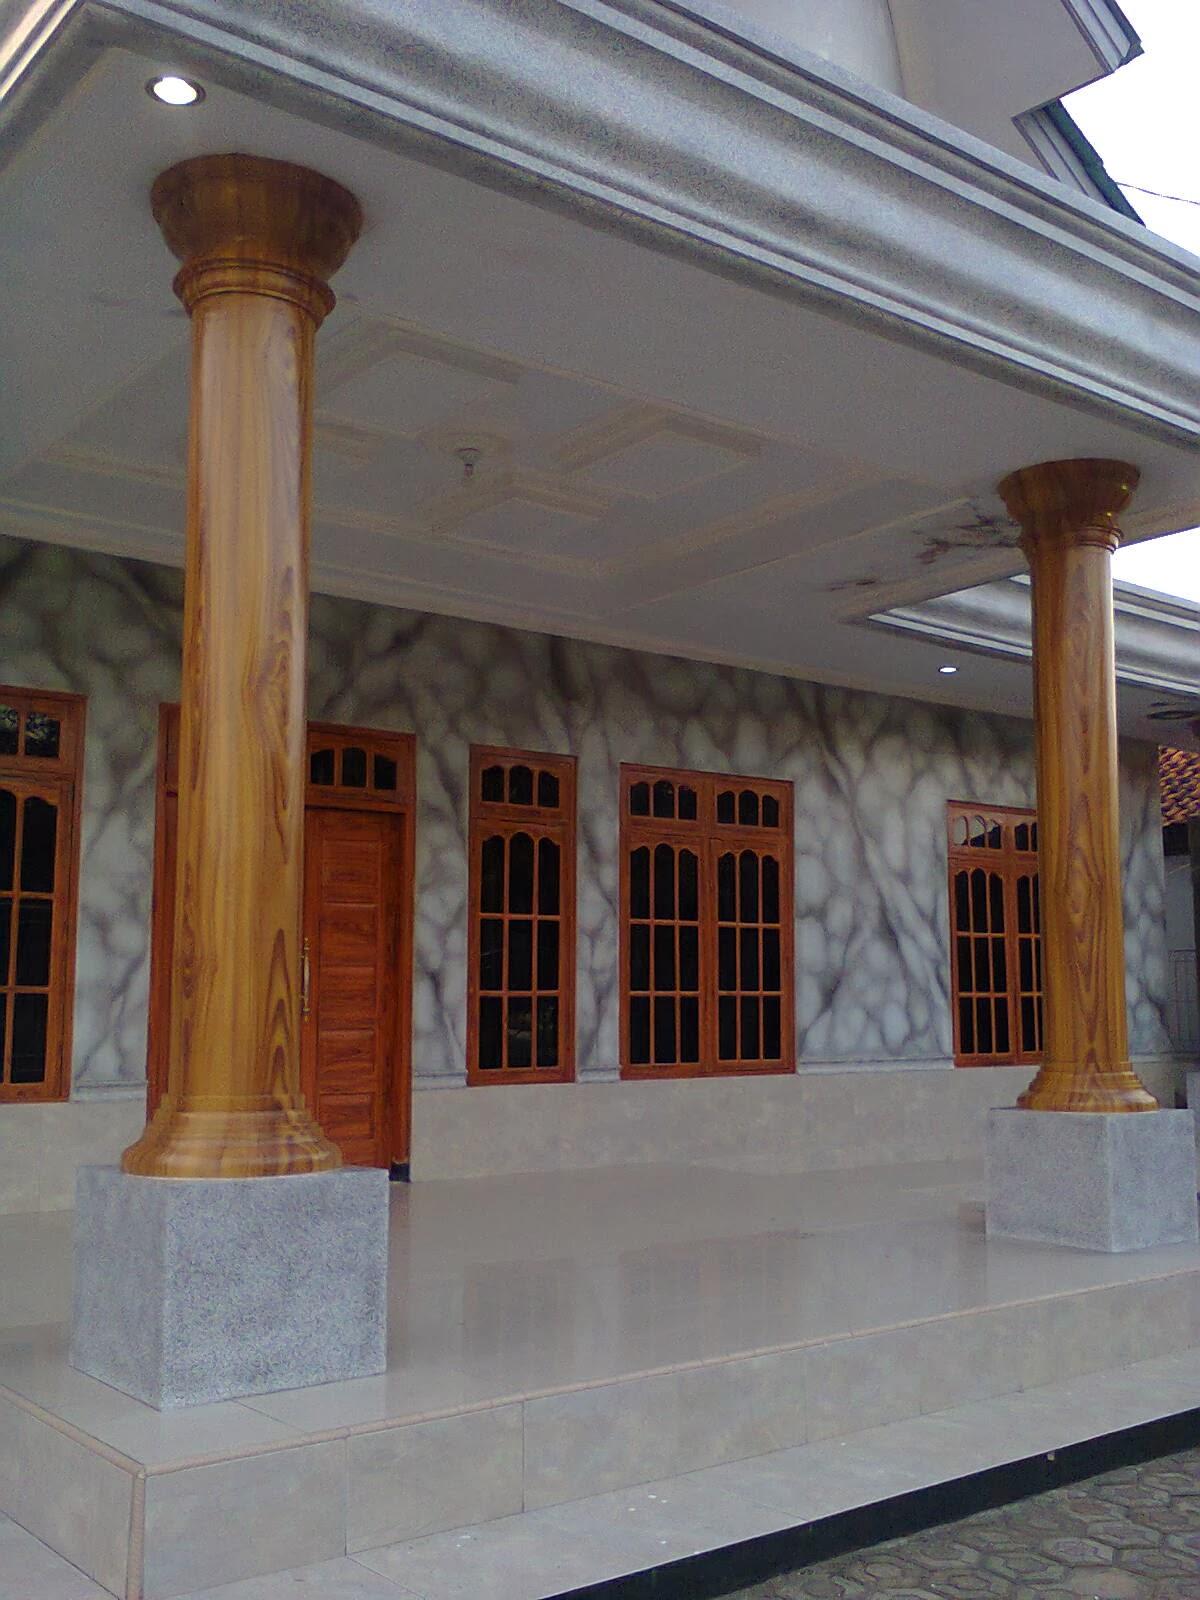 Contoh gambar untuk cat pilar motif kayu dan tembok motif marmer